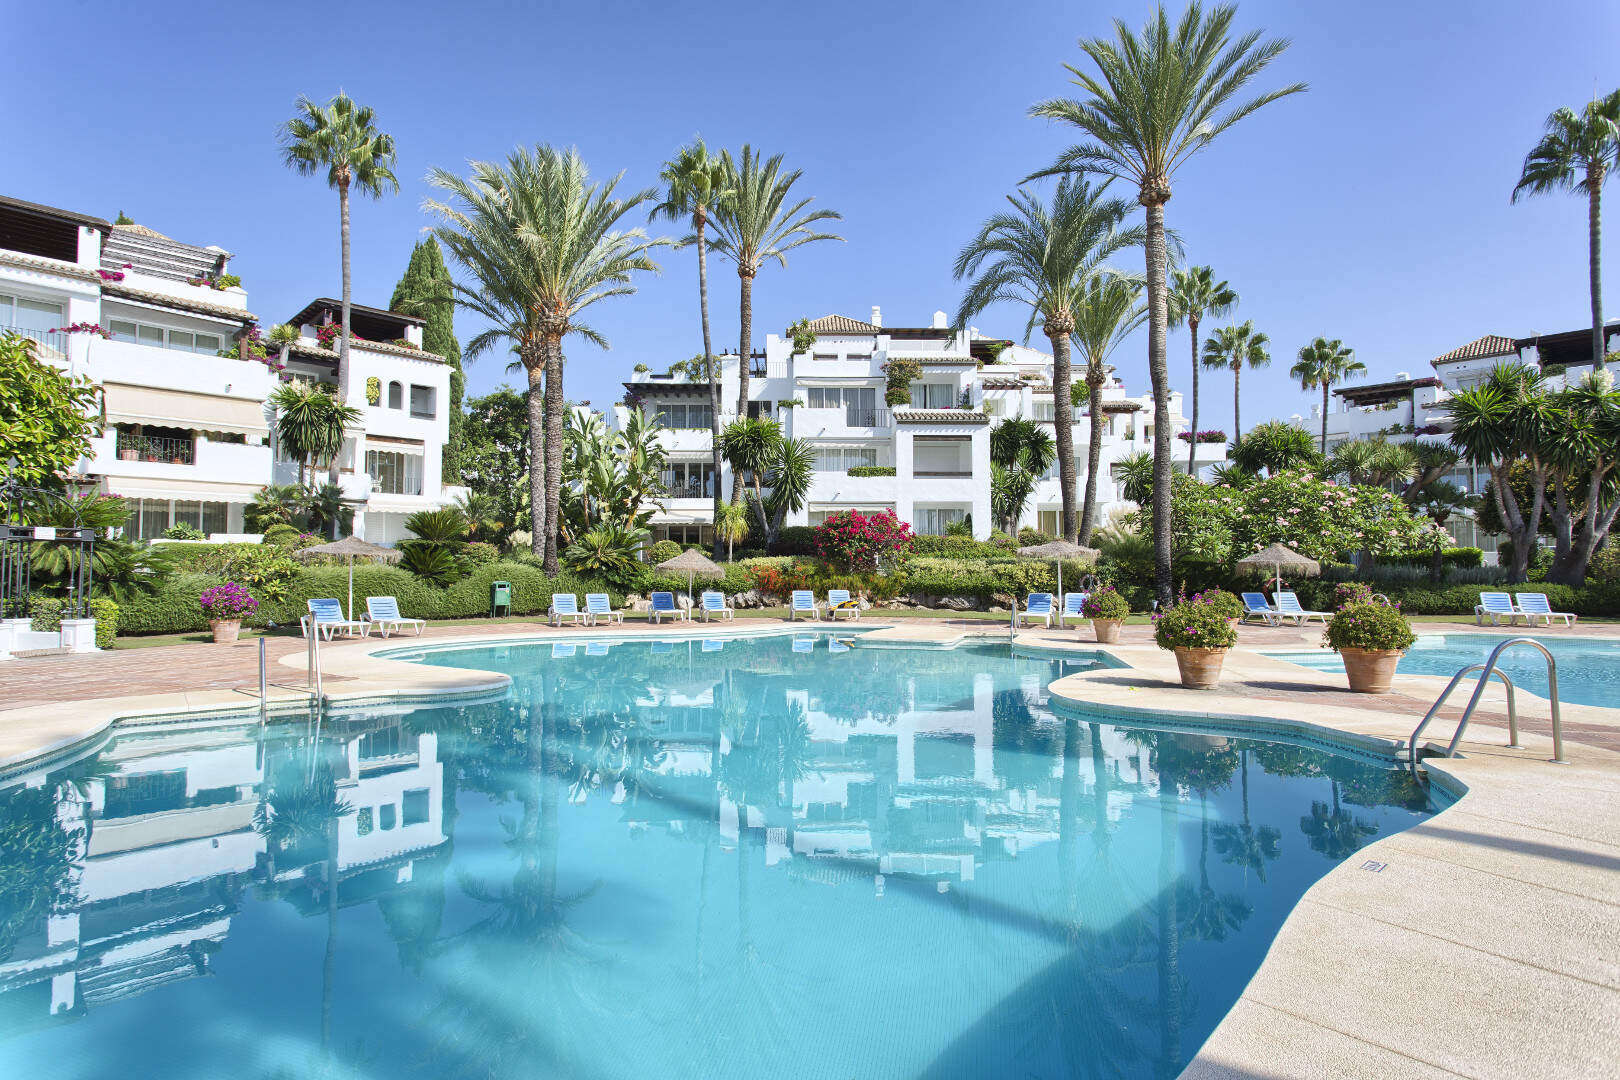 Alcazaba Beach, 3 bedroom Duplex Penthouse in front line beach complex walking distance to Estepona town centre